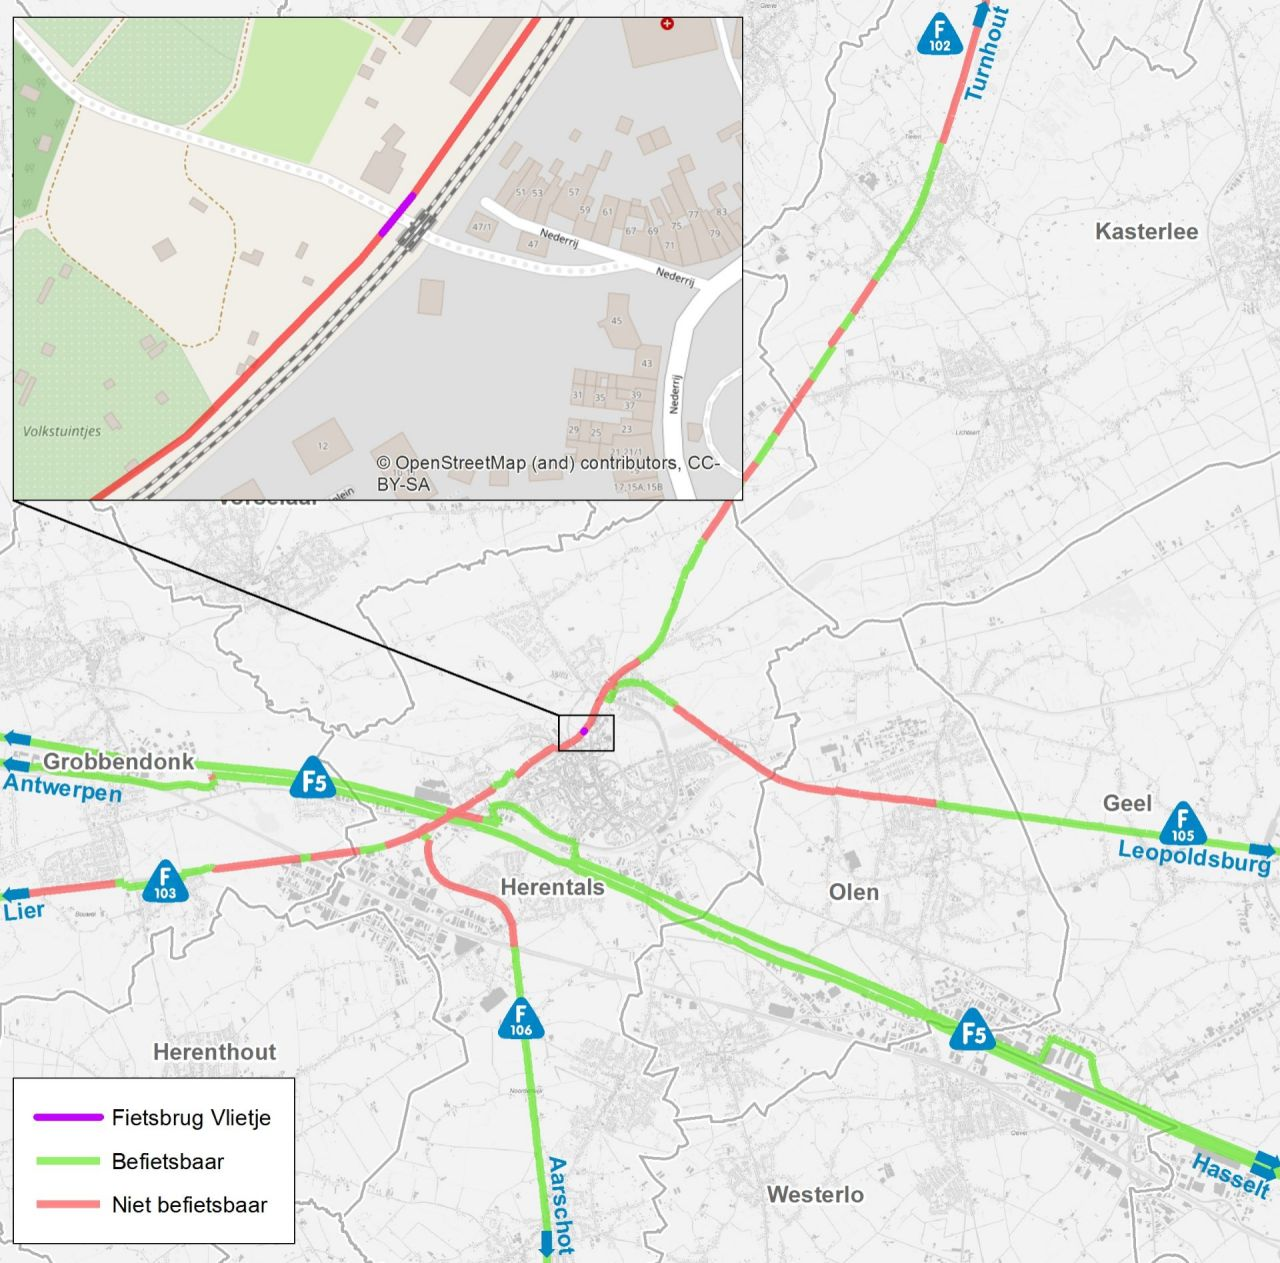 L015 Herentals - Balen (L15) ('fiets-o-strade' 7 - 'fiets-o-strade van de Kempen') Fietsnelweg F105  - Page 3 1607252569246